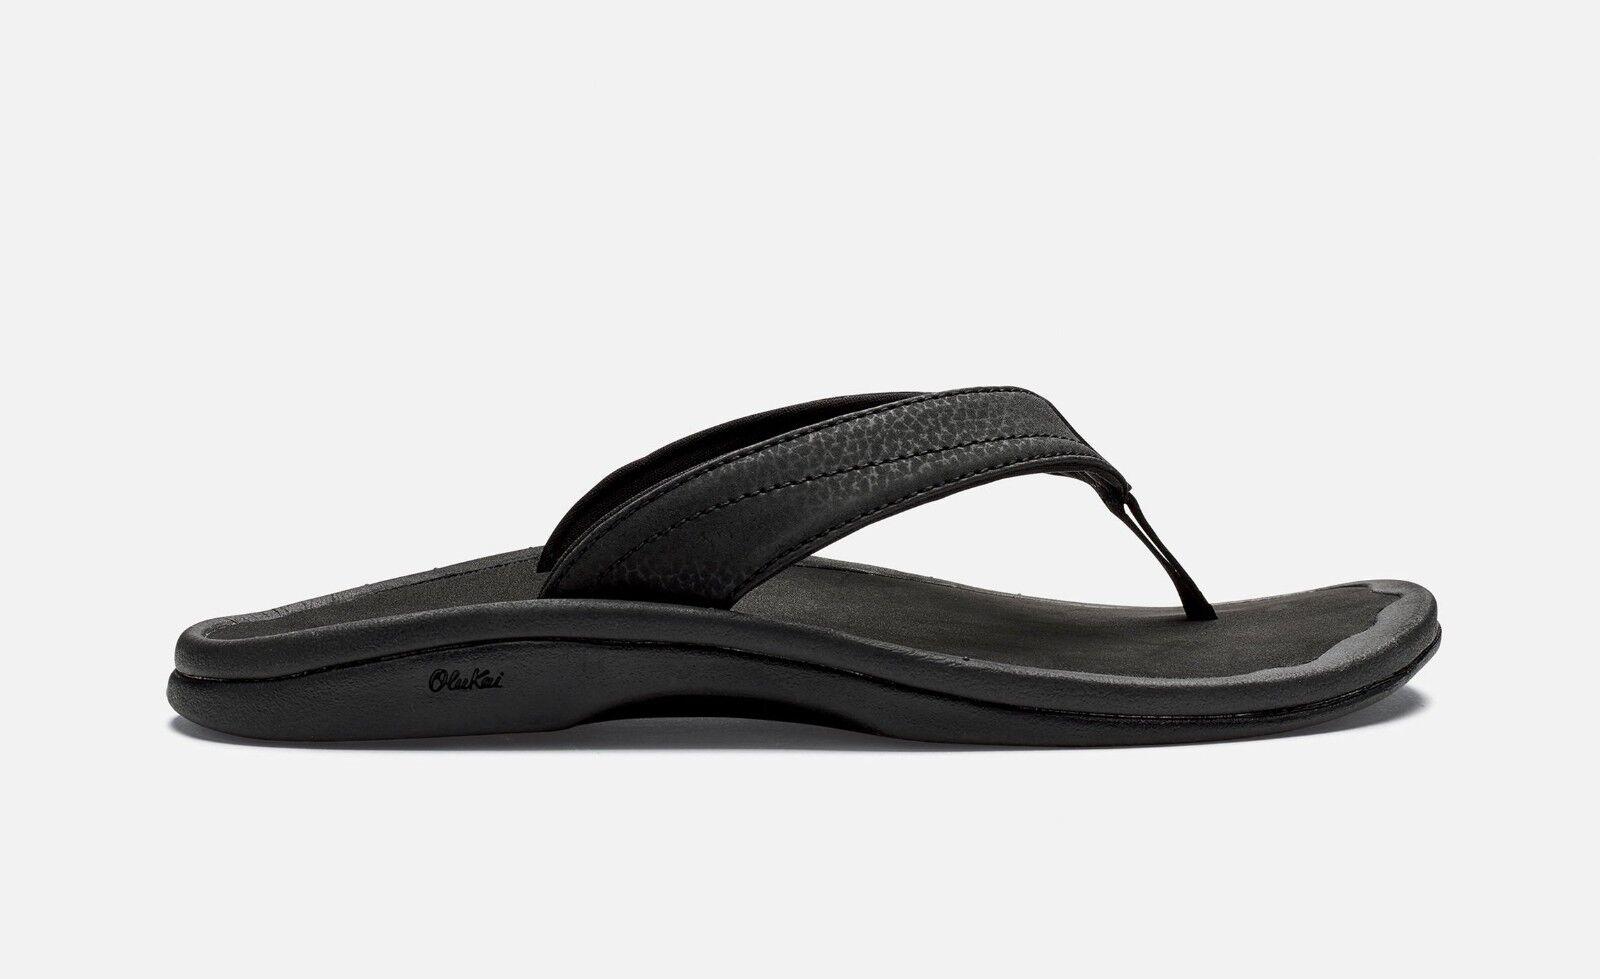 OluKai 'Ohana Womens Flip Flop Sandals Black   Black 20110-4040  62